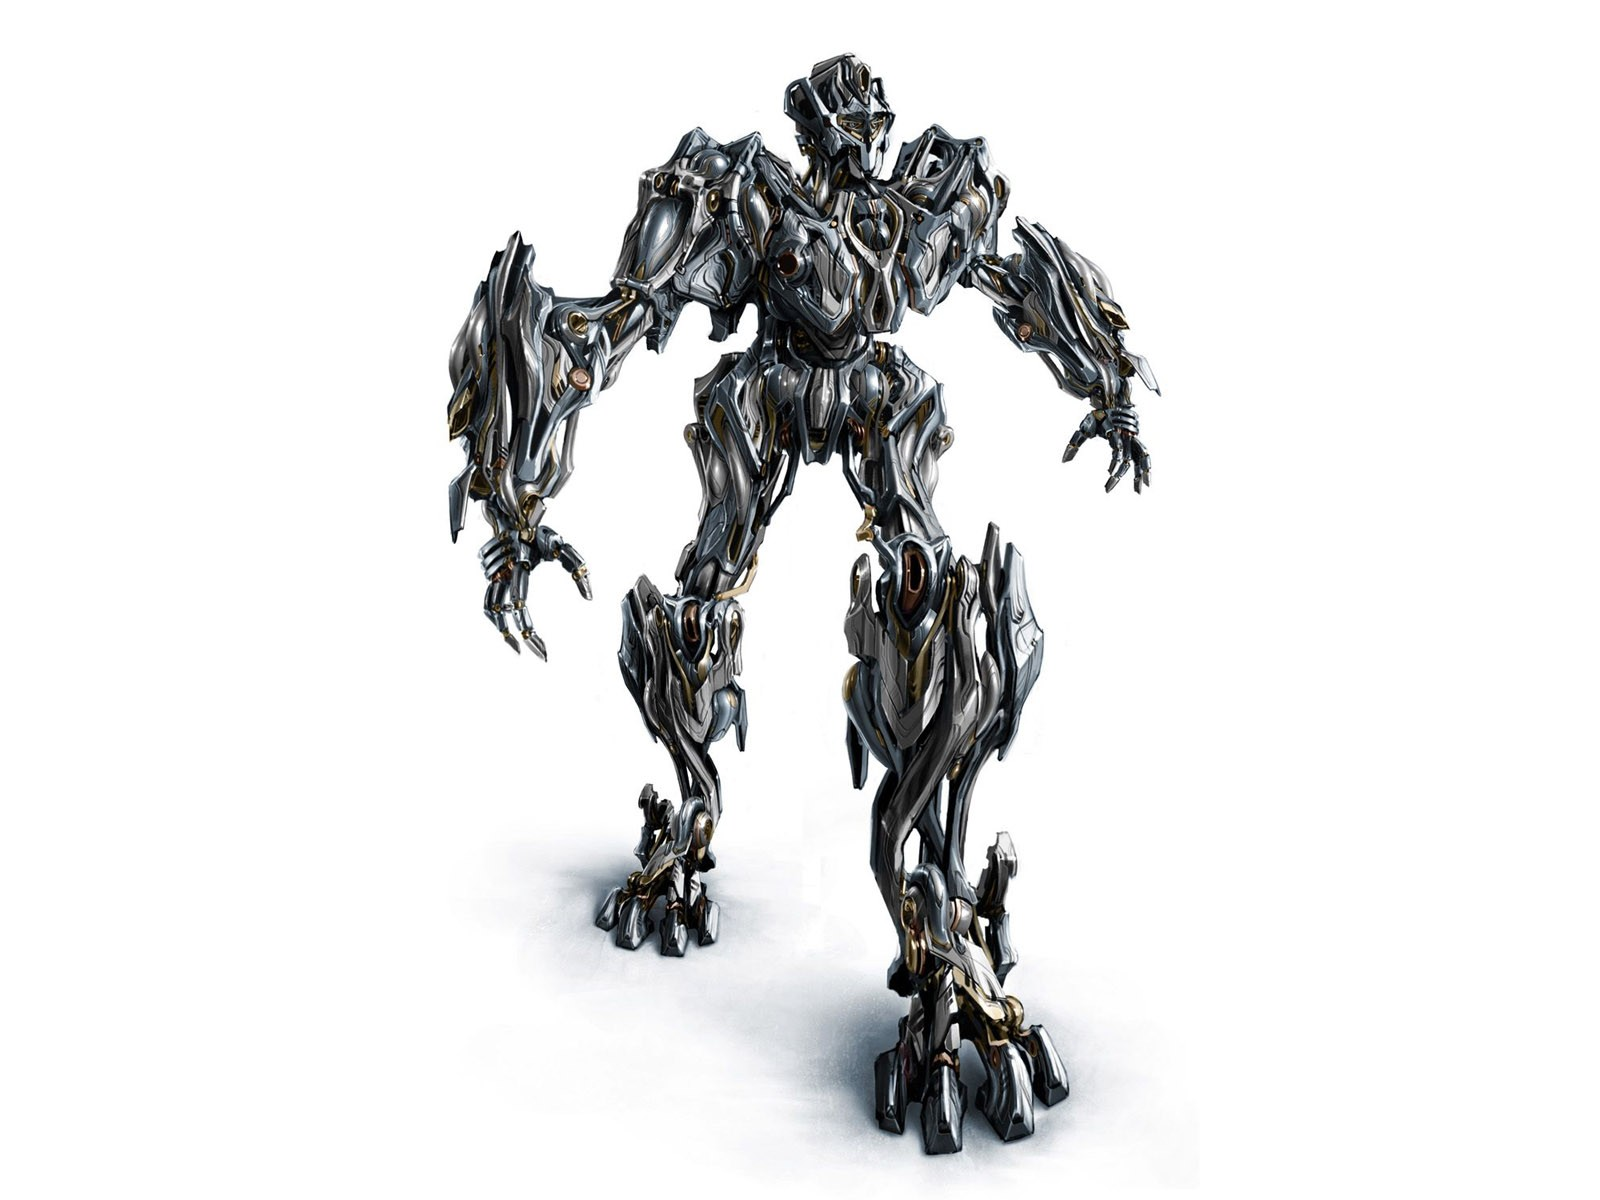 image transformers 1 transformers - movies movies